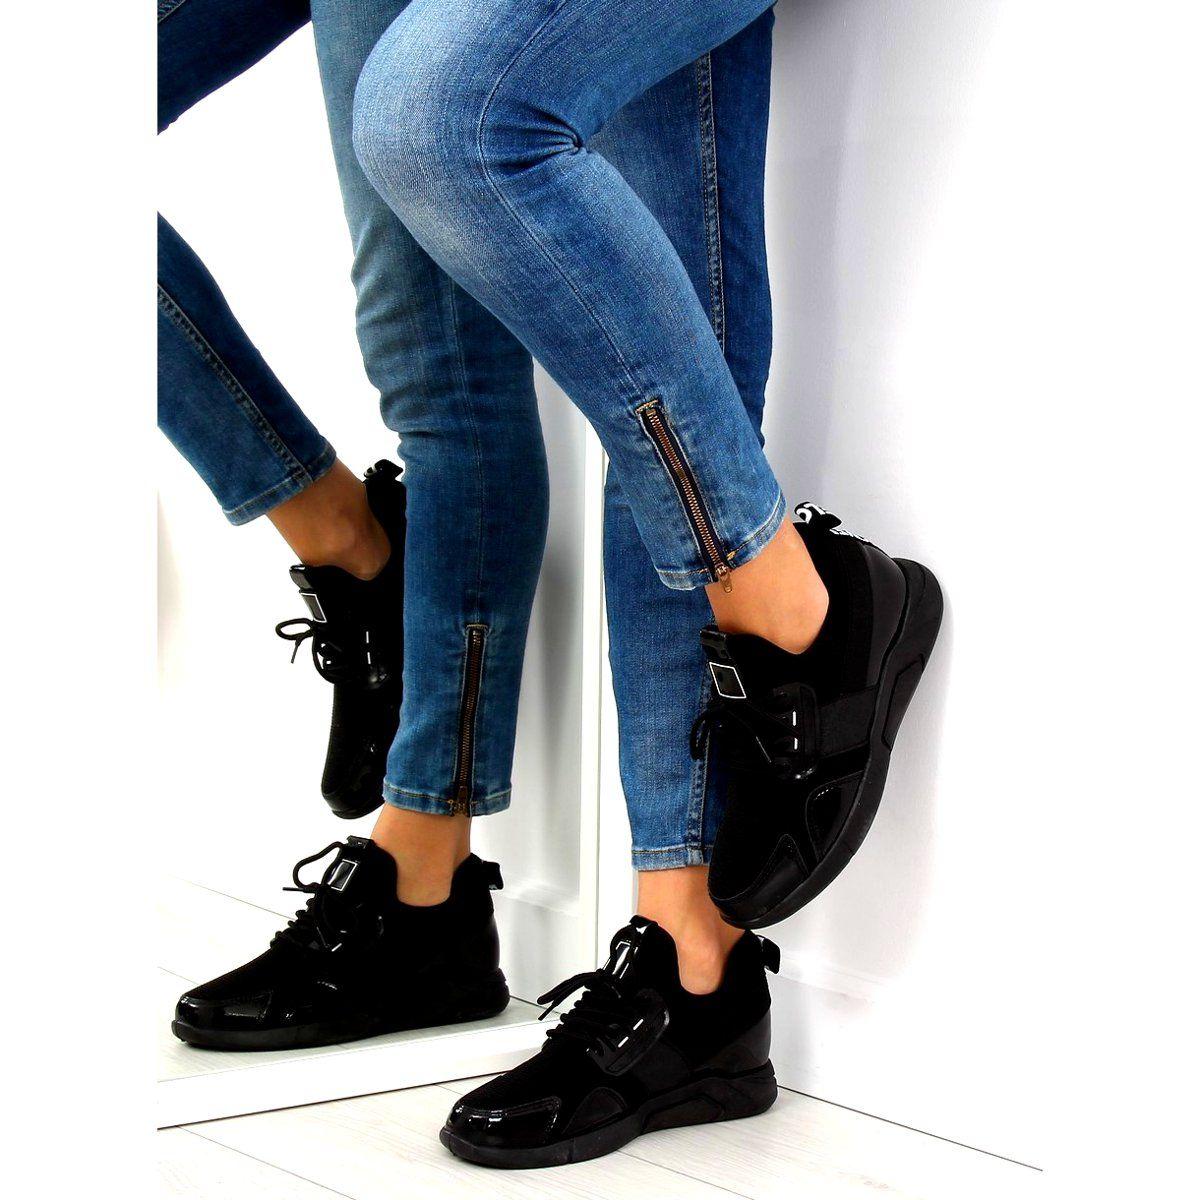 Buty Sportowe Na Koturnie Czarne Nb226p 1 Insta Fashion Fashion Fashion Addict